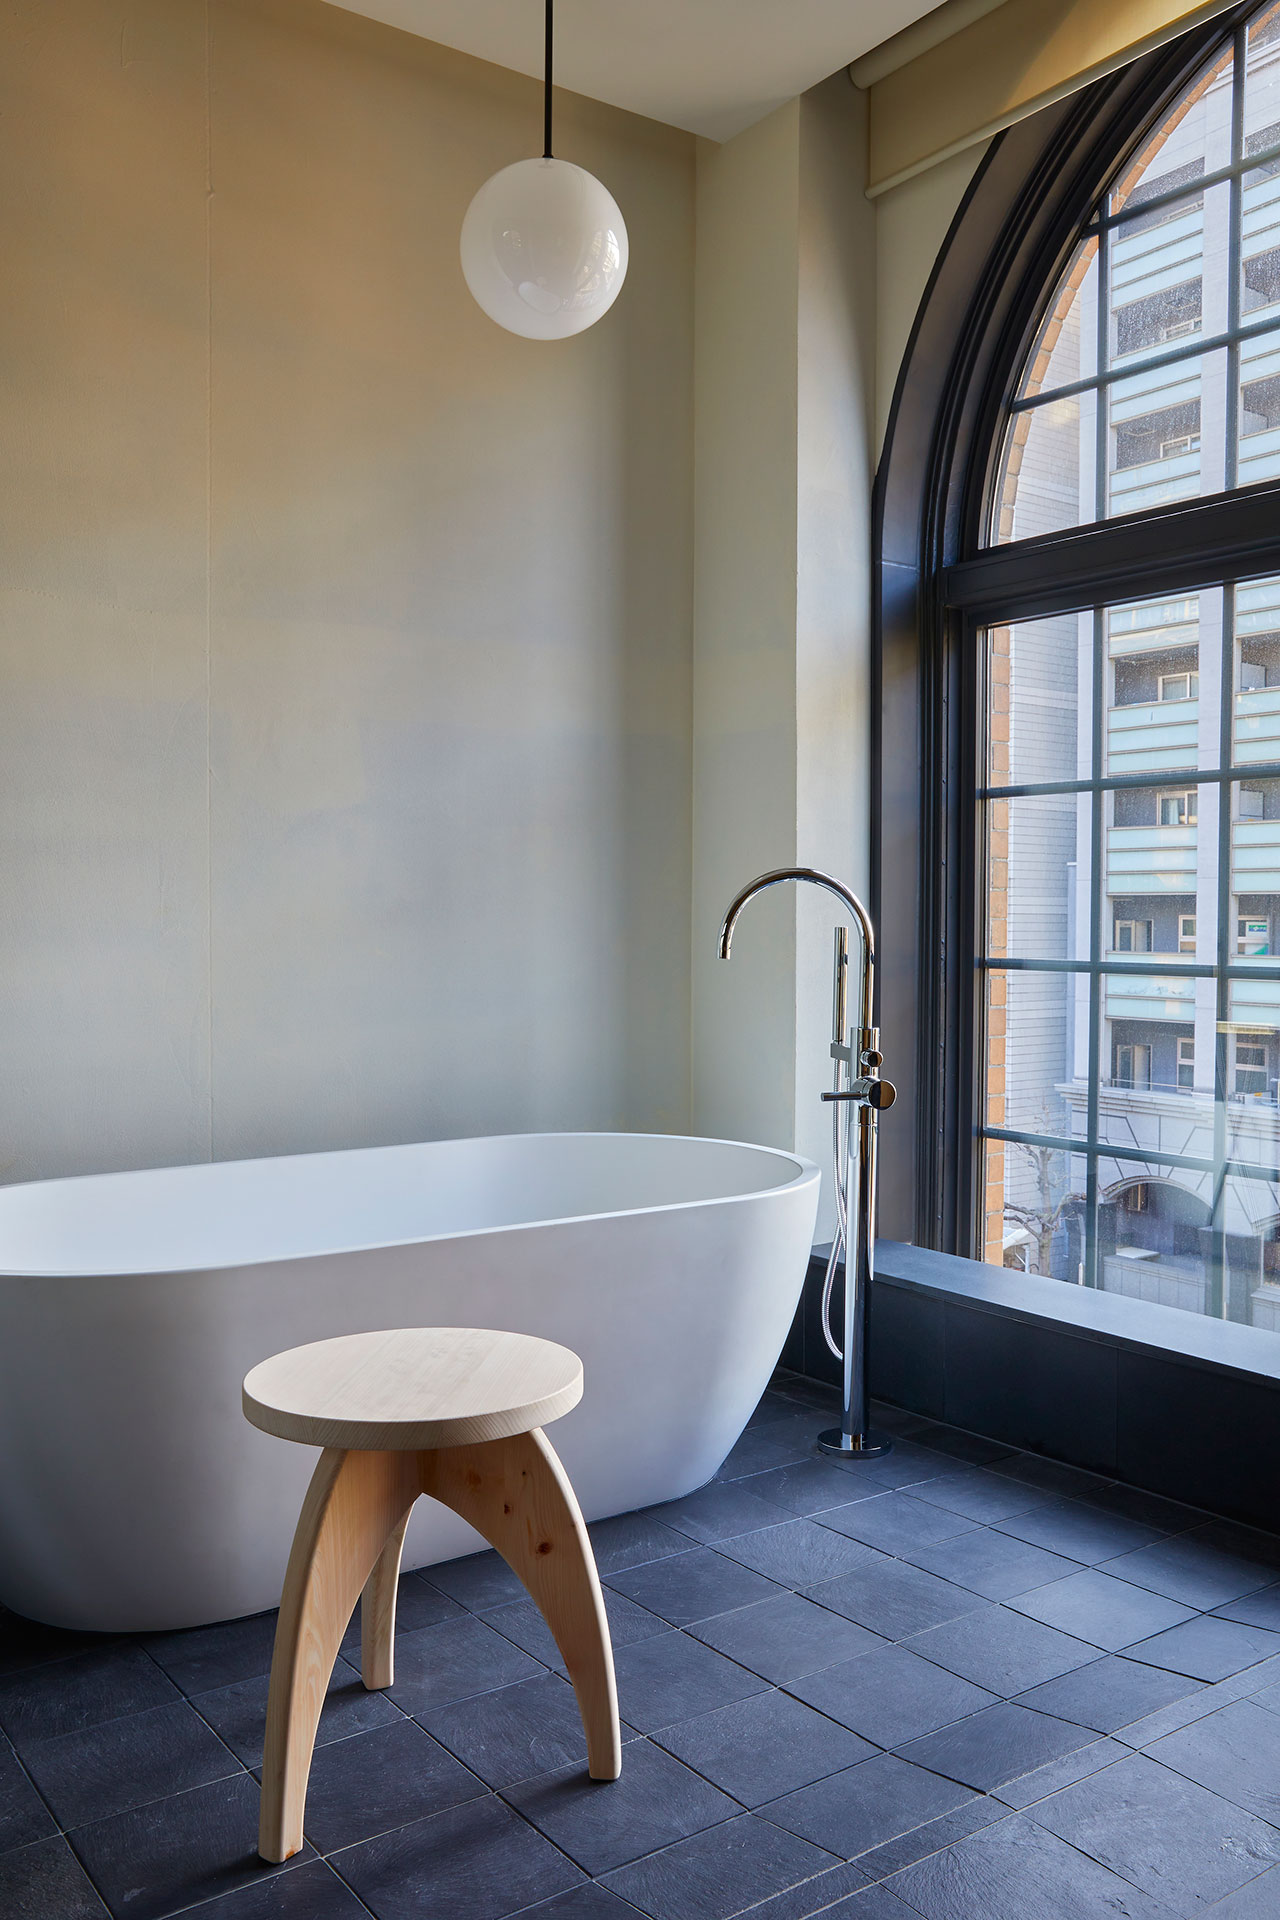 Ace Hotel Kyoto. Guestroom bathroom. Photo by Yoshihiro Makino.